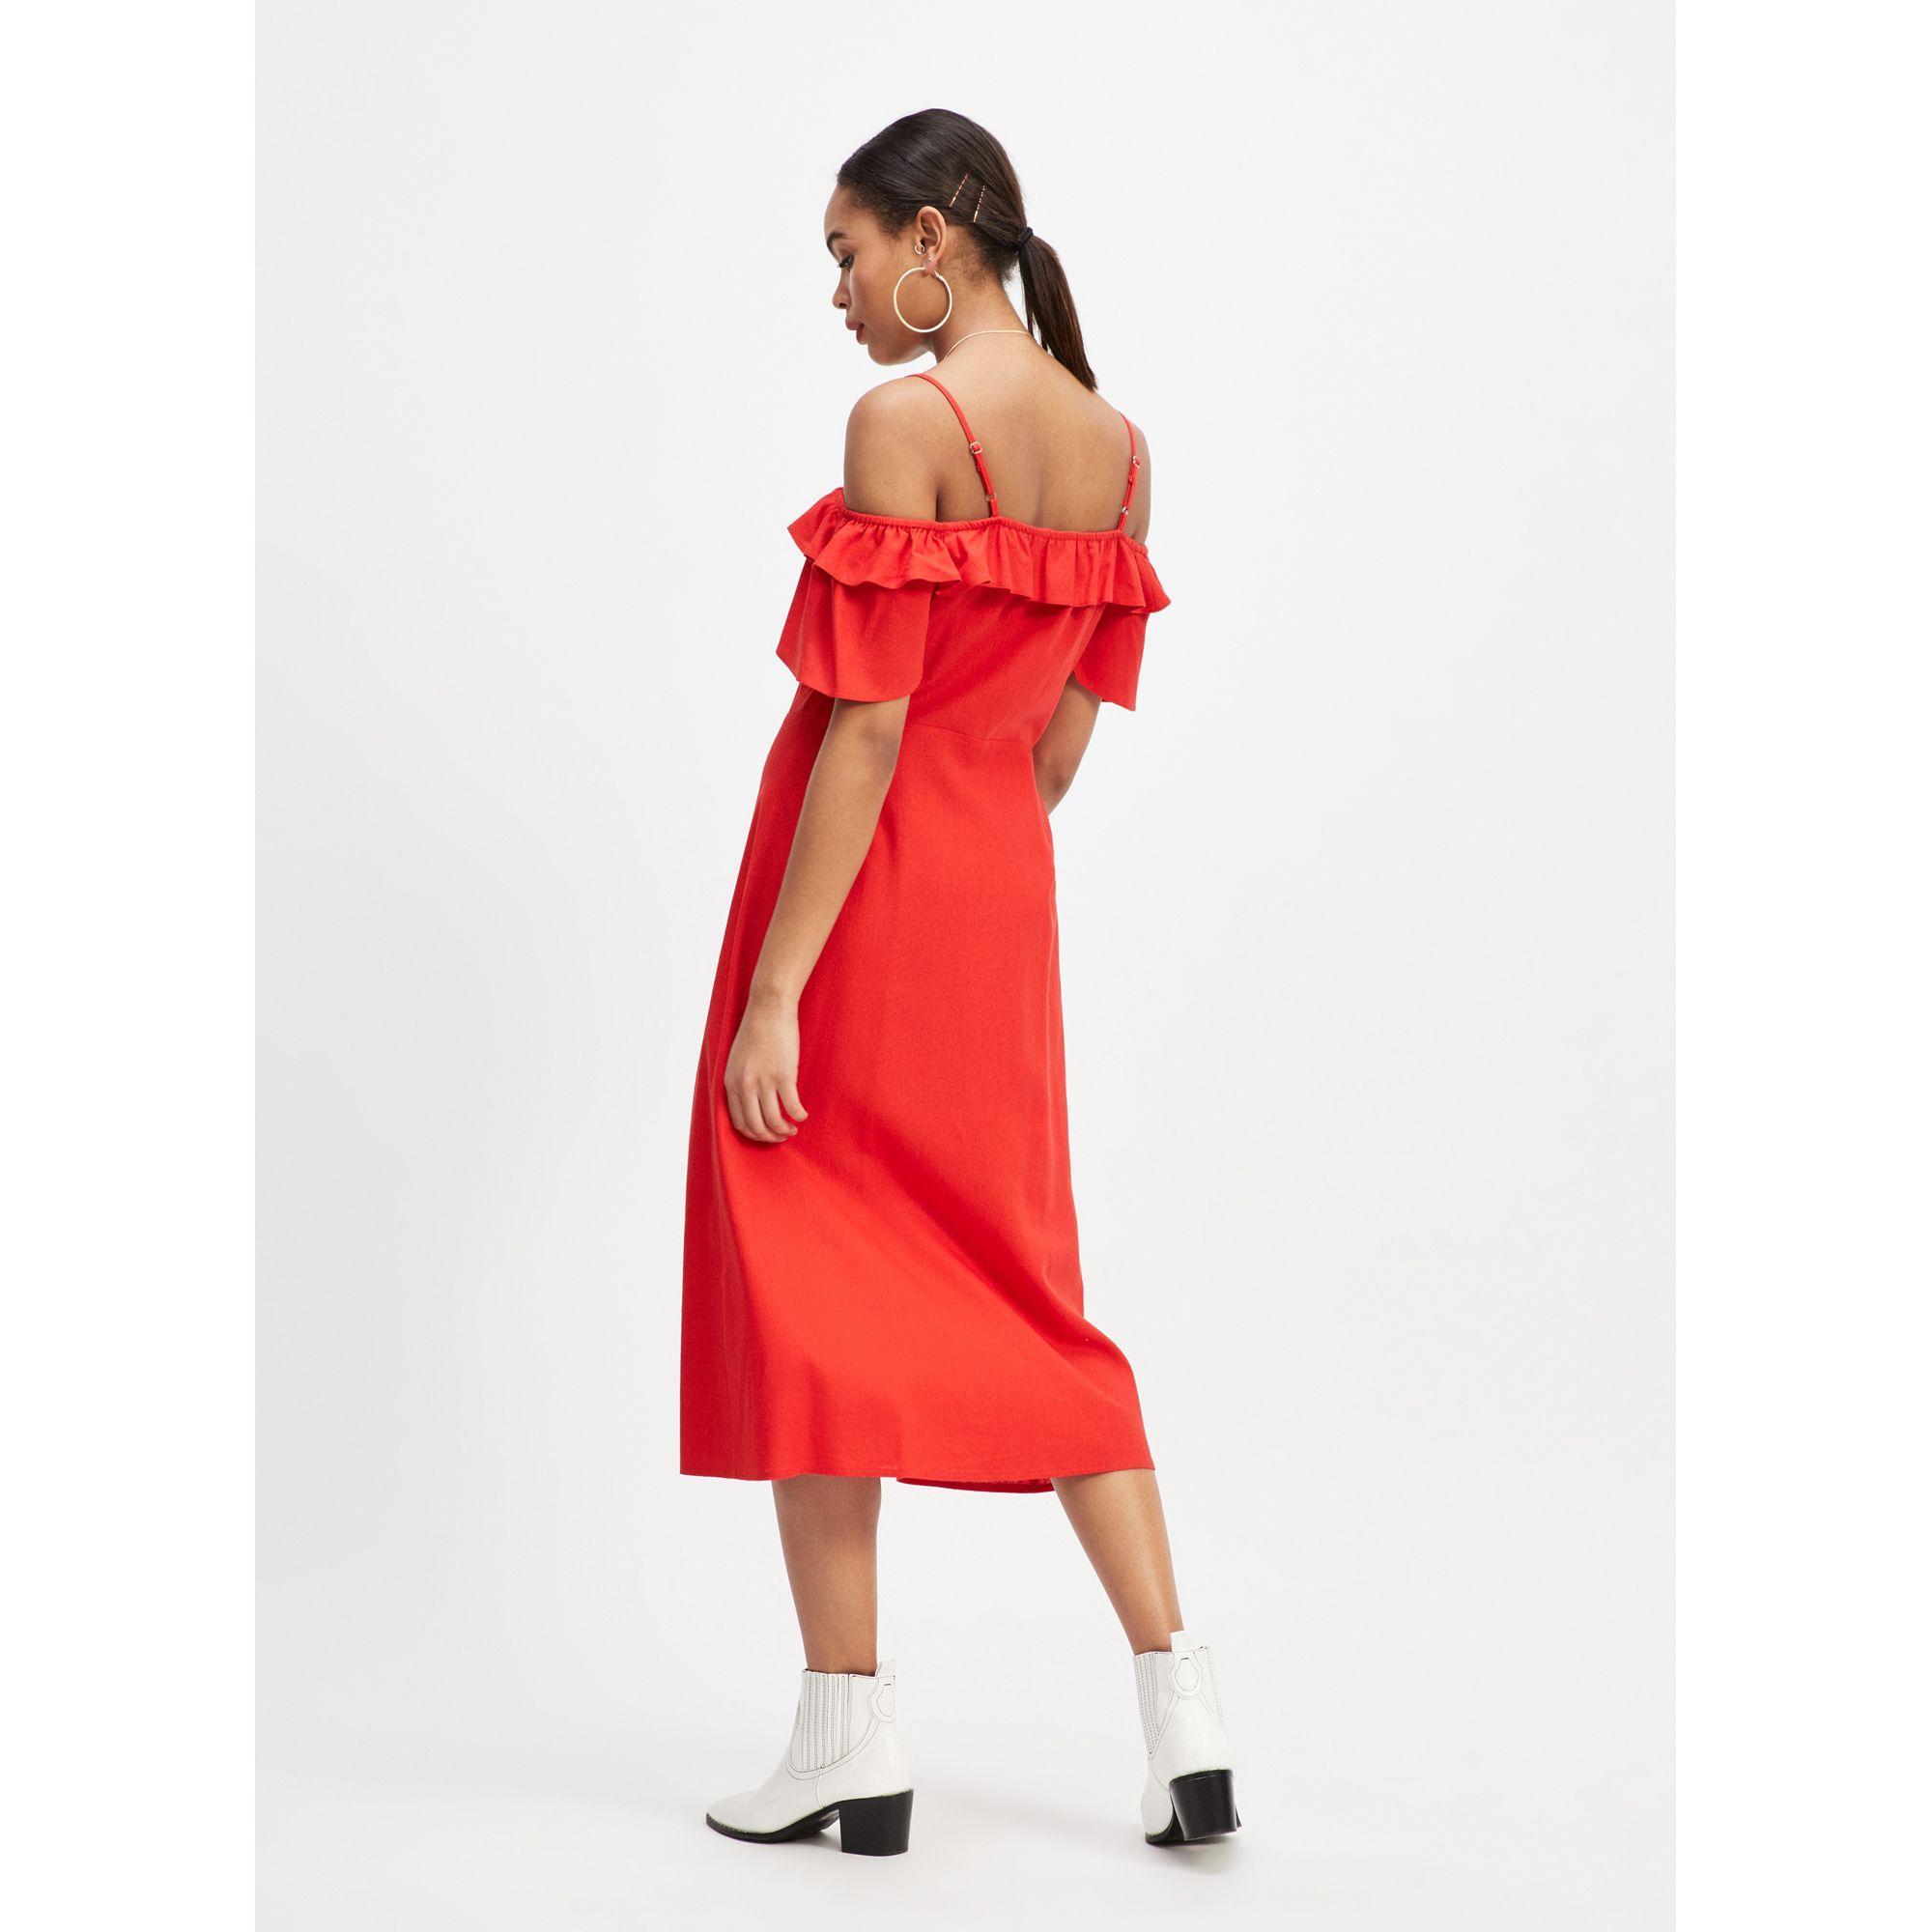 0be4da89c77166 Miss Selfridge Red Linen Bardot Midi Dress in Red - Lyst